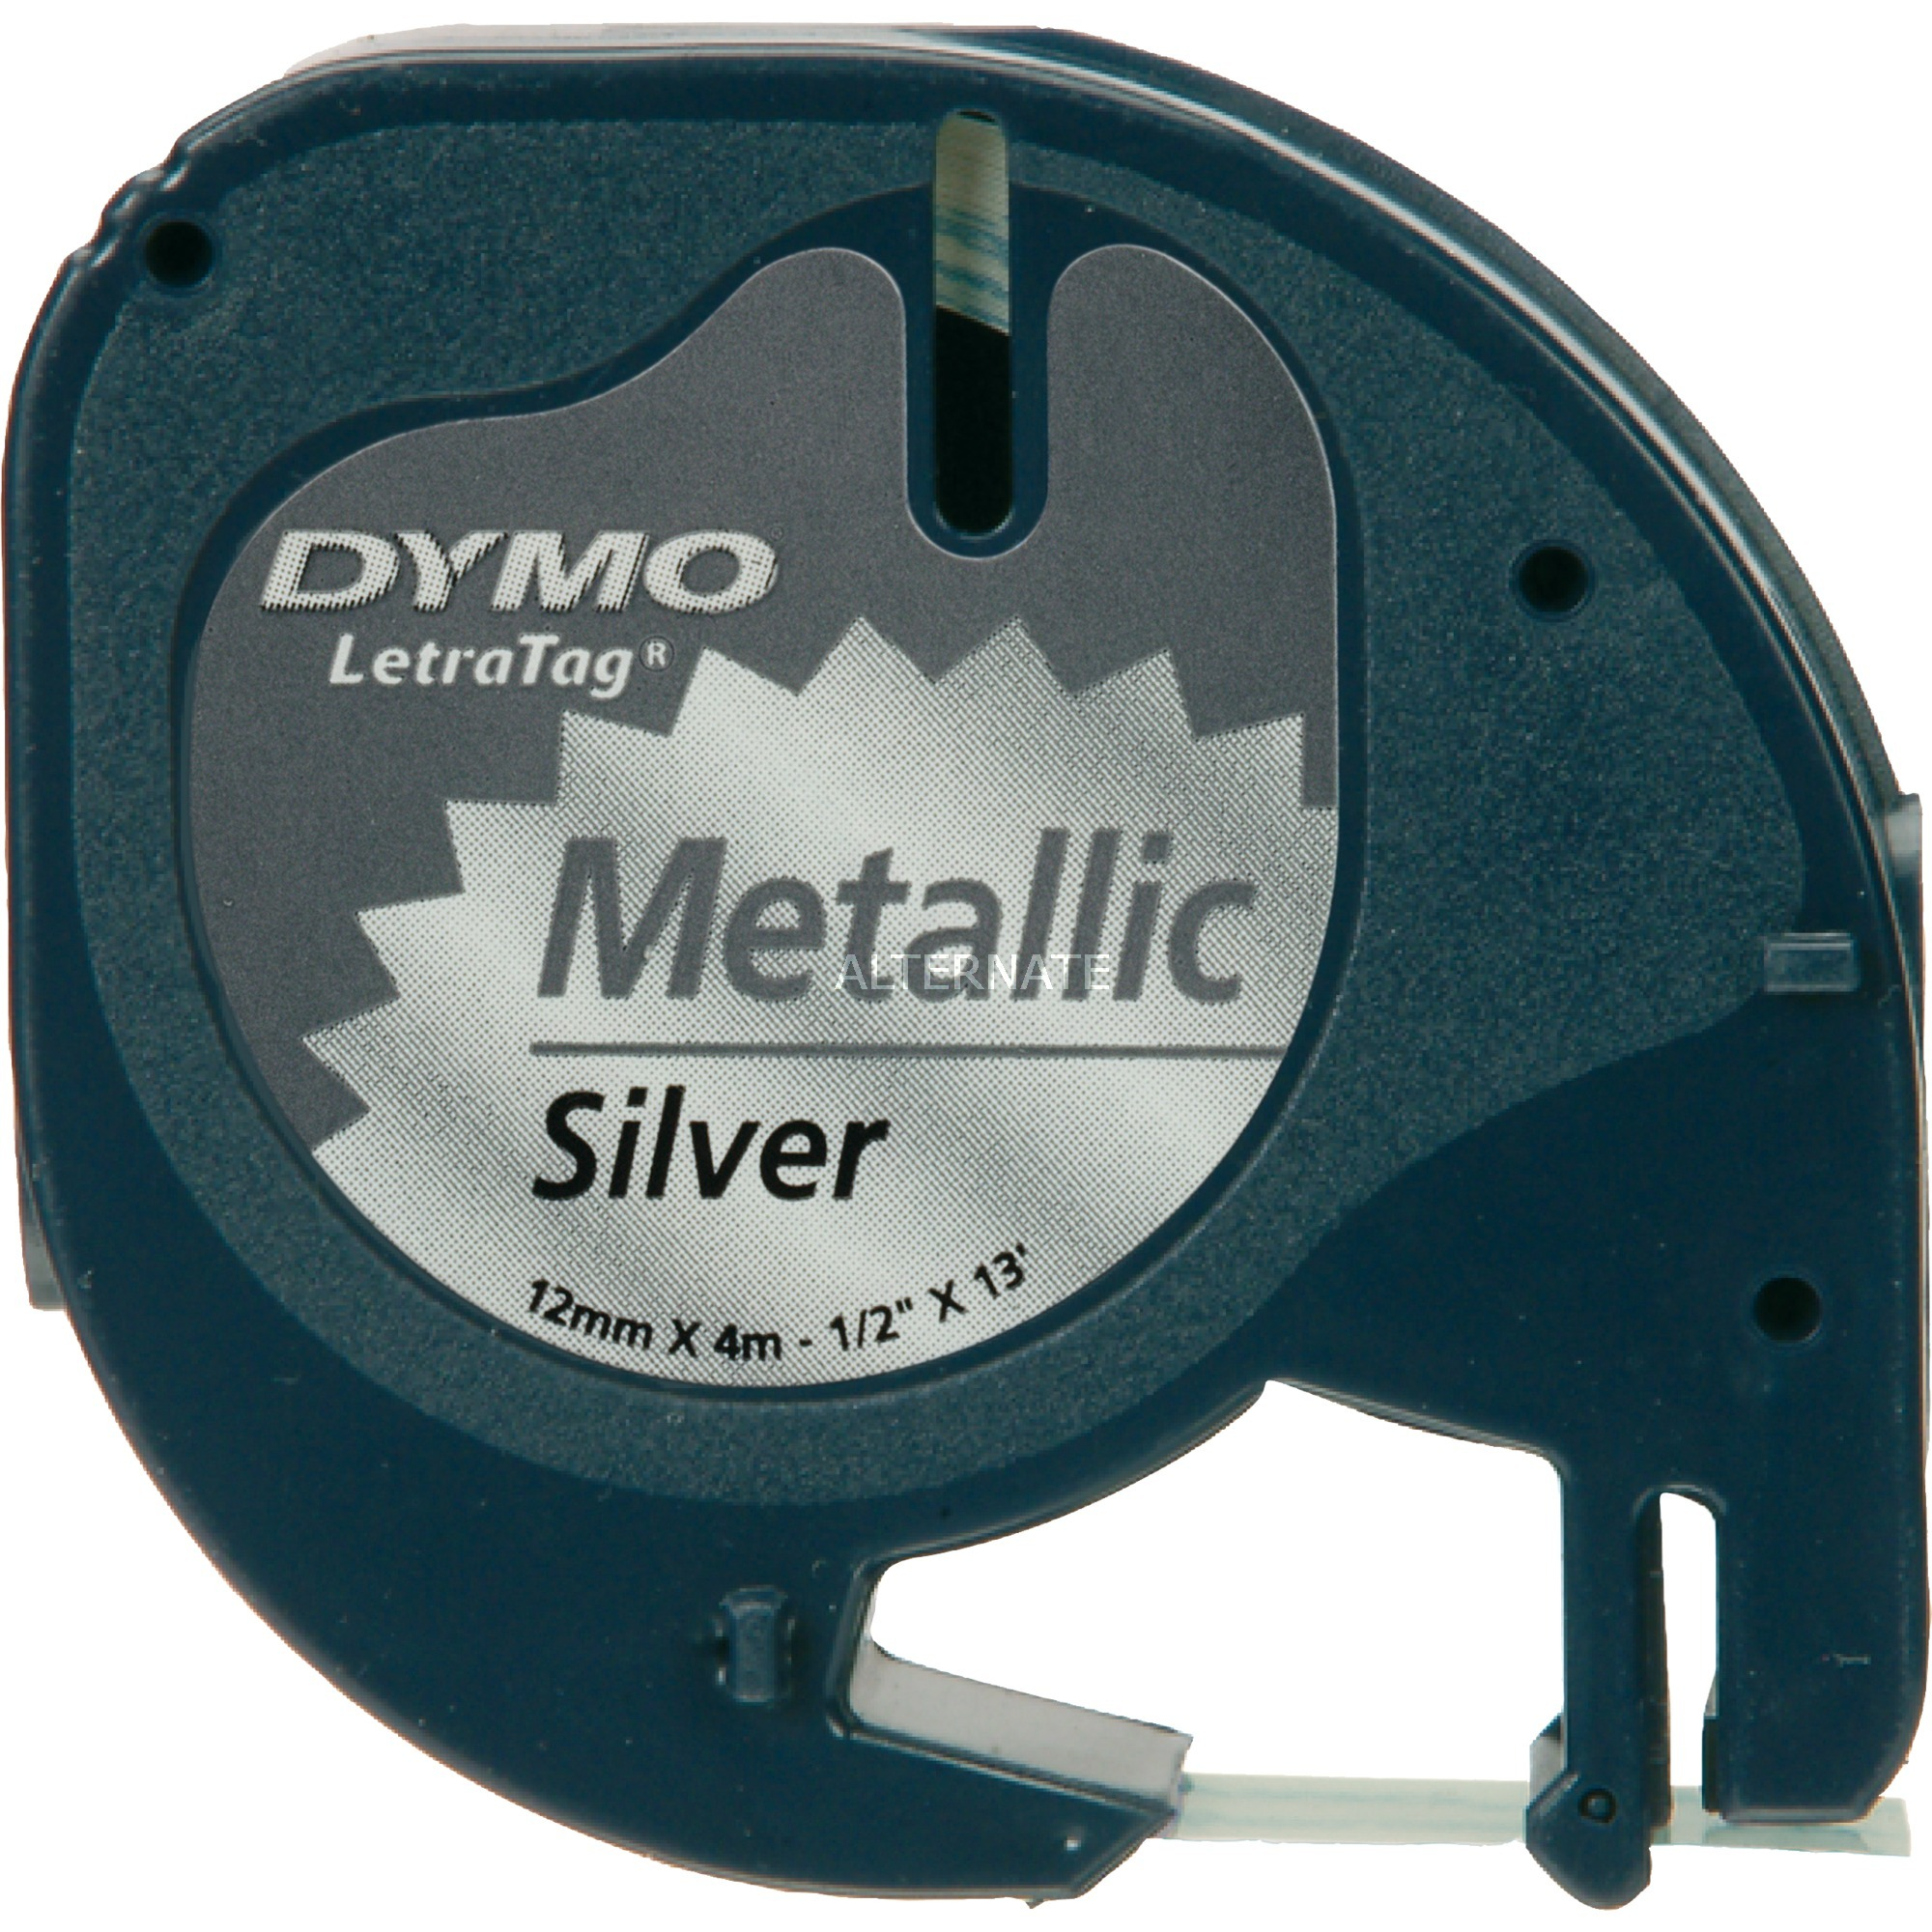 LetraTAG Metallic tape cinta para impresora de etiquetas, Cinta de escritura